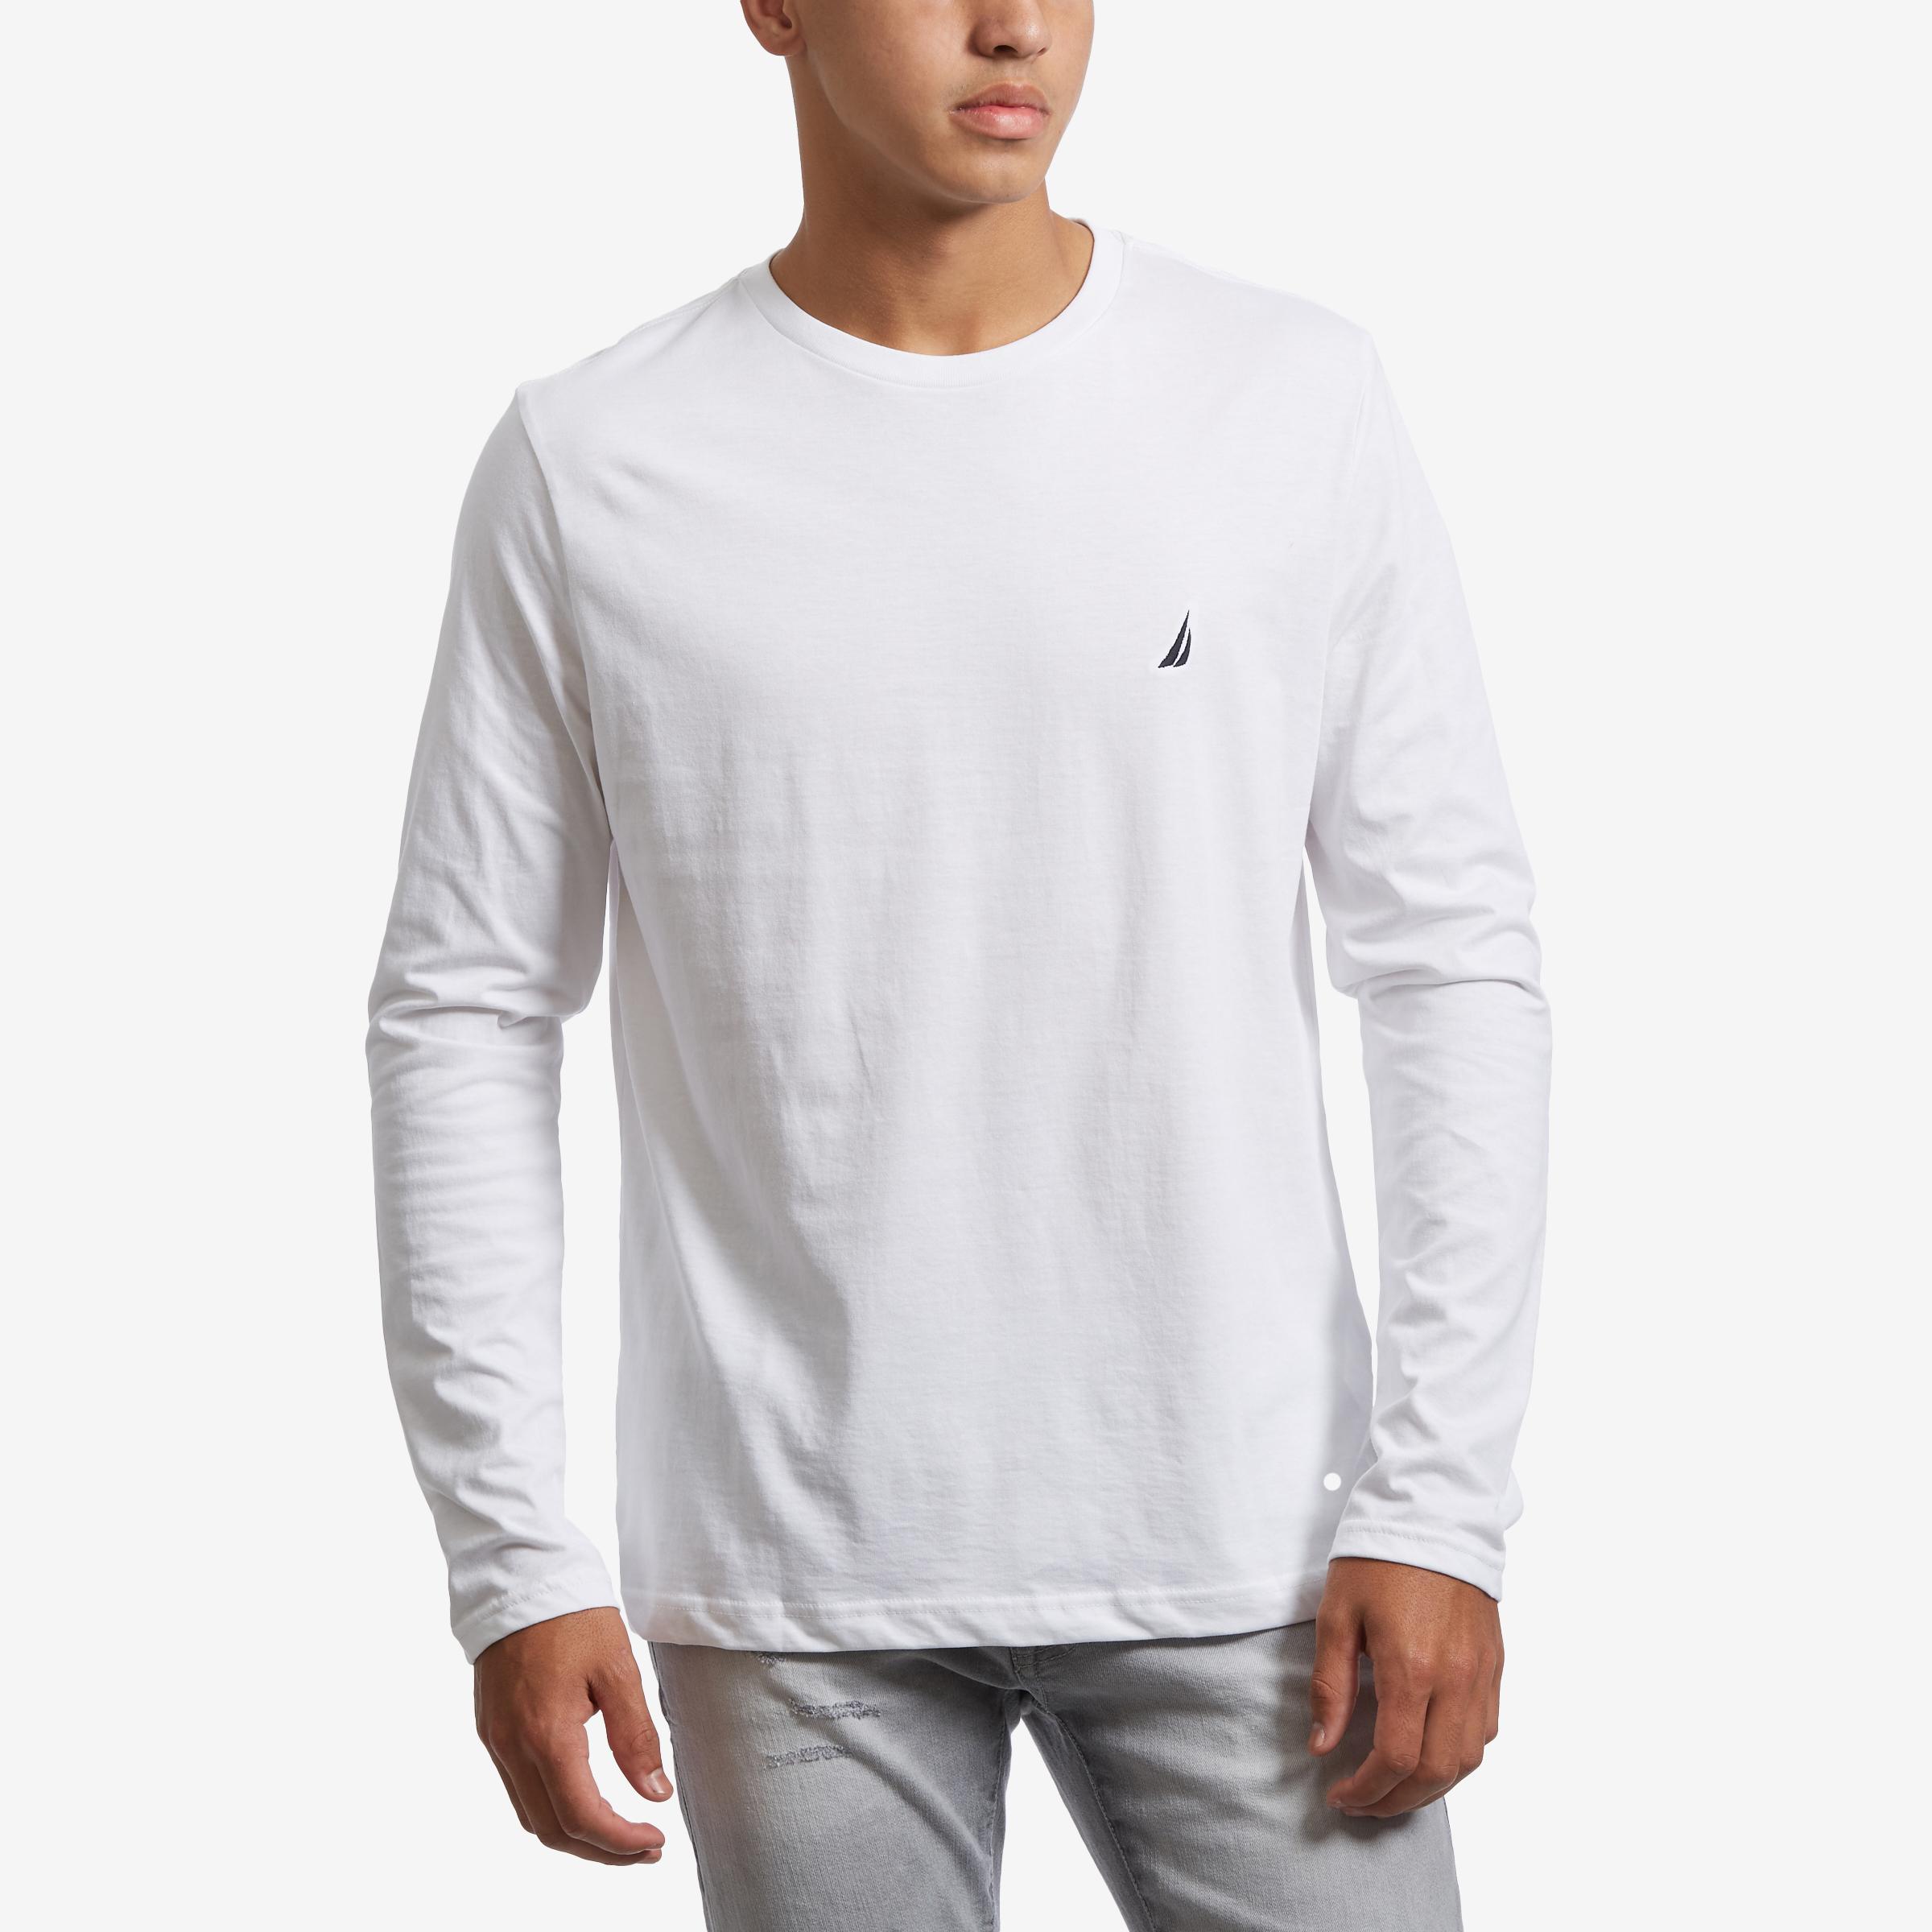 Long Sleeve Crew Neck T- Shirt